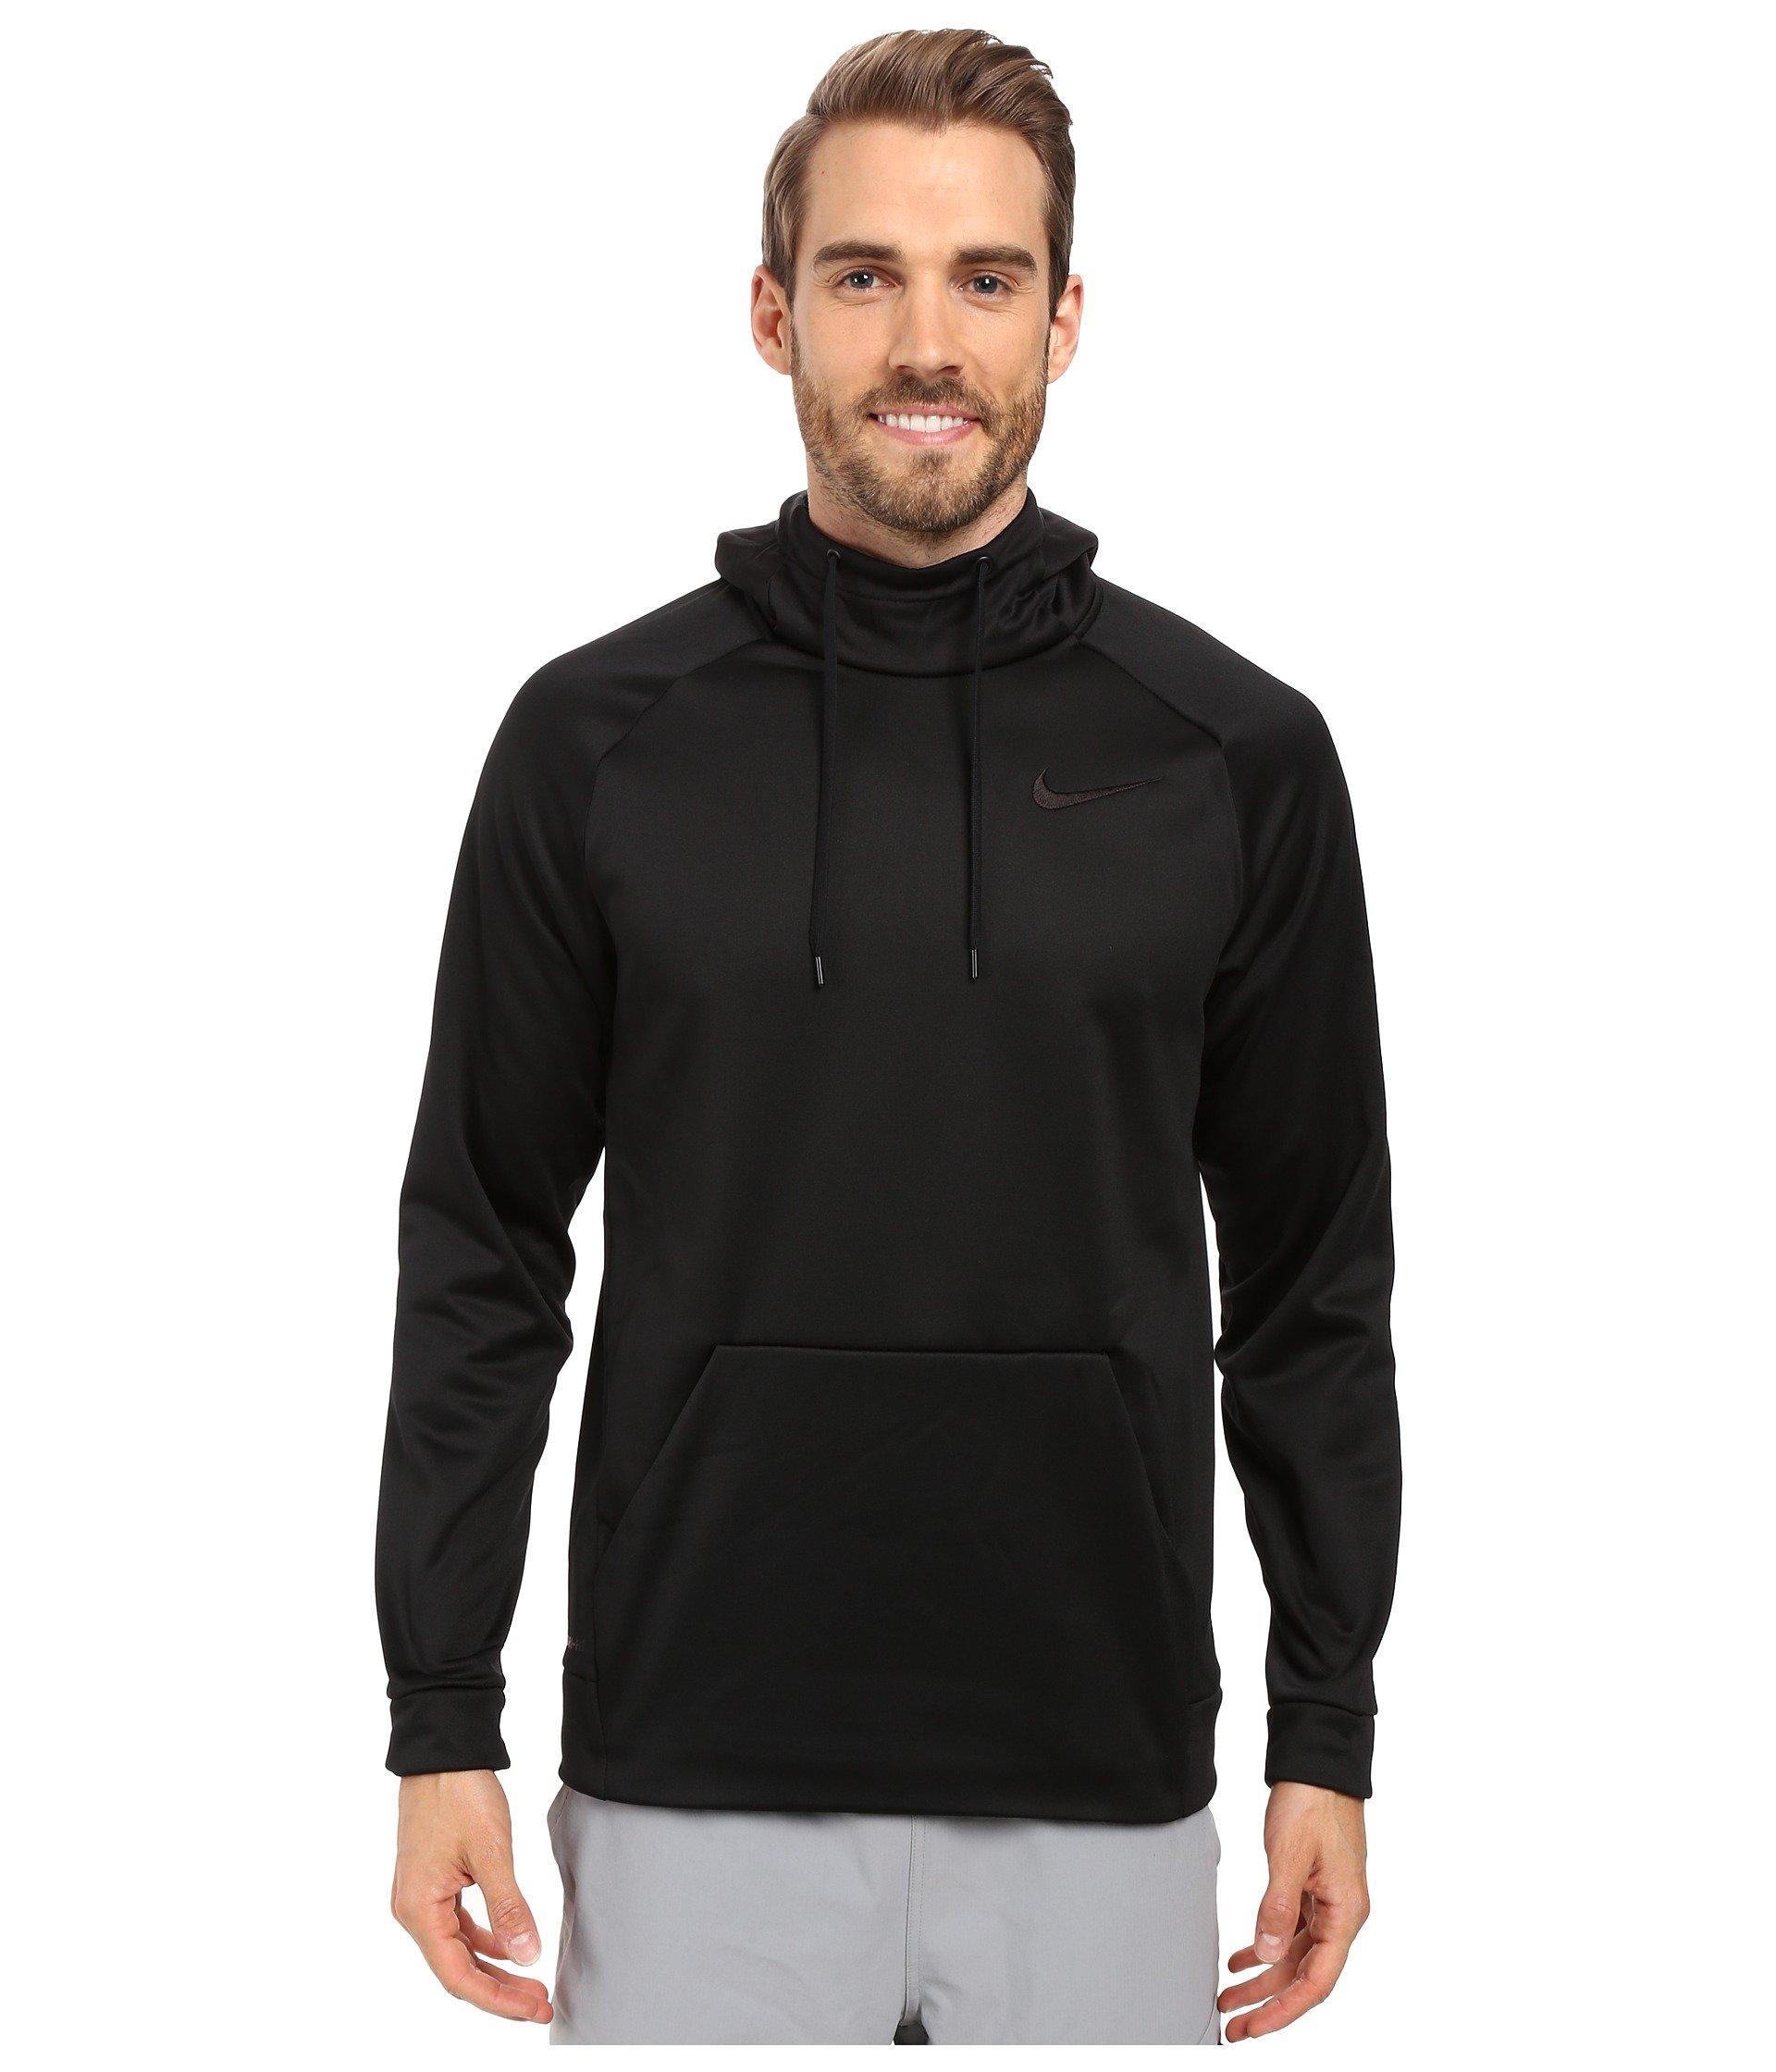 Nike Men's Therma Training Hoodie Black/Dark Grey Size Large by Nike